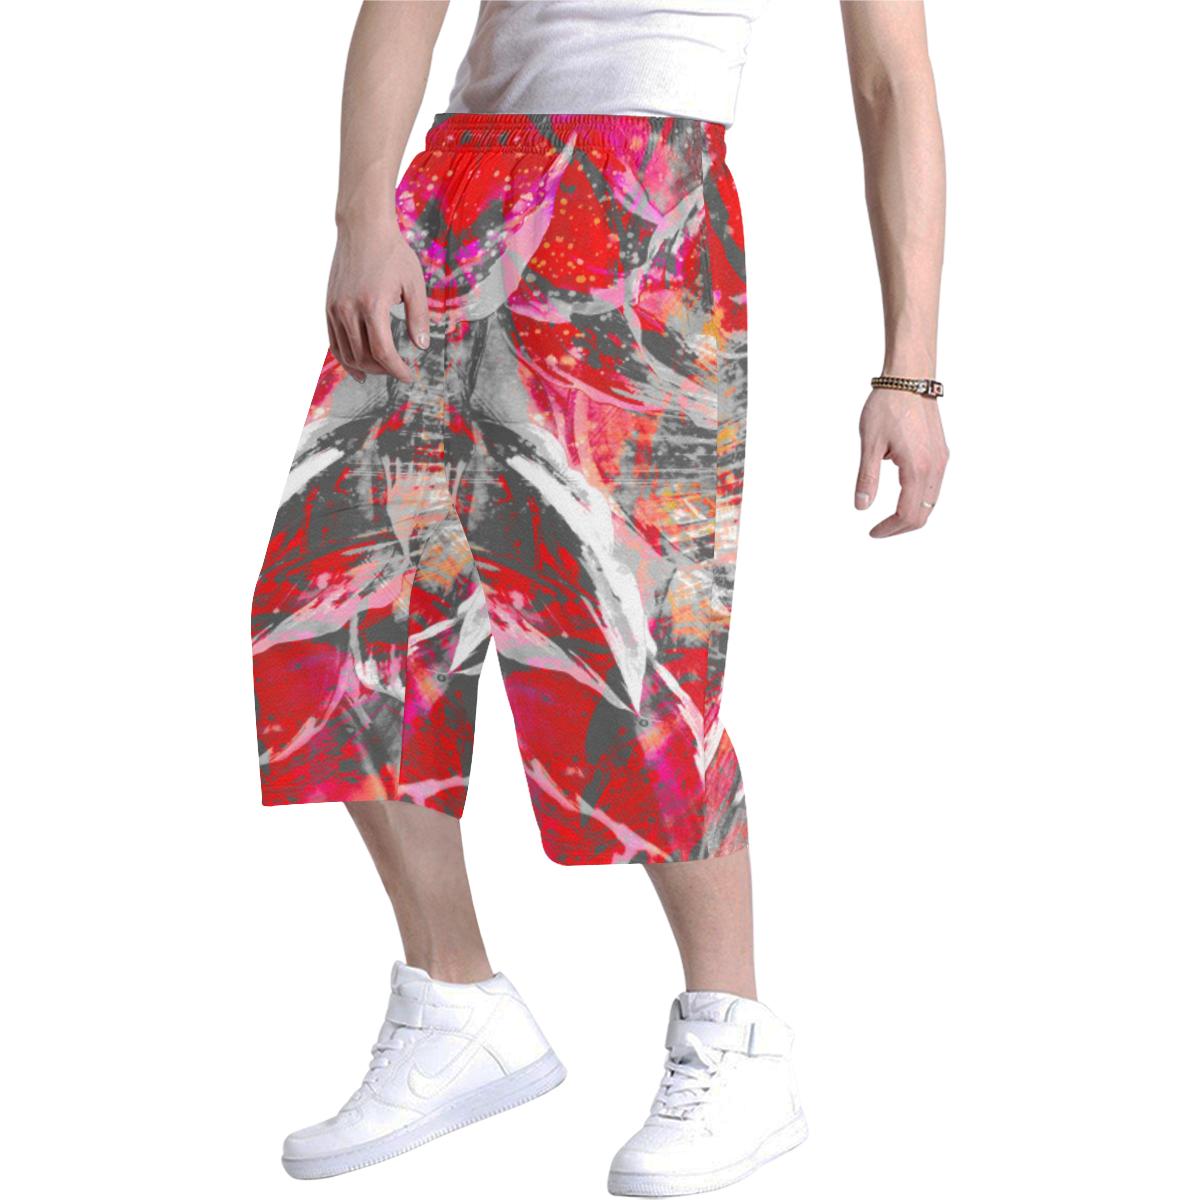 wheelVibe_vibe33 Men's All Over Print Baggy Shorts (Model L37)